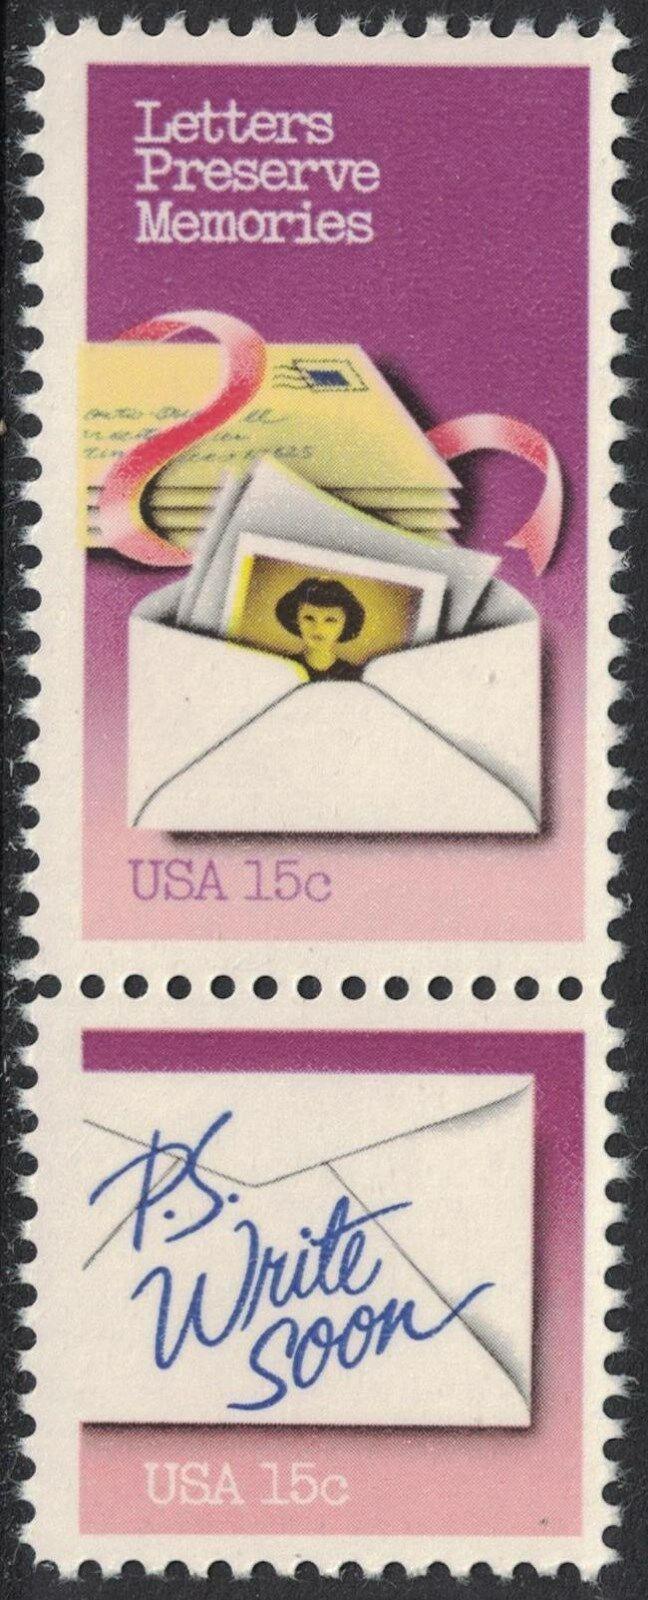 United States - Scott #1805-1806 (1980) Letters Preserve Memories/P.S. Write Soon